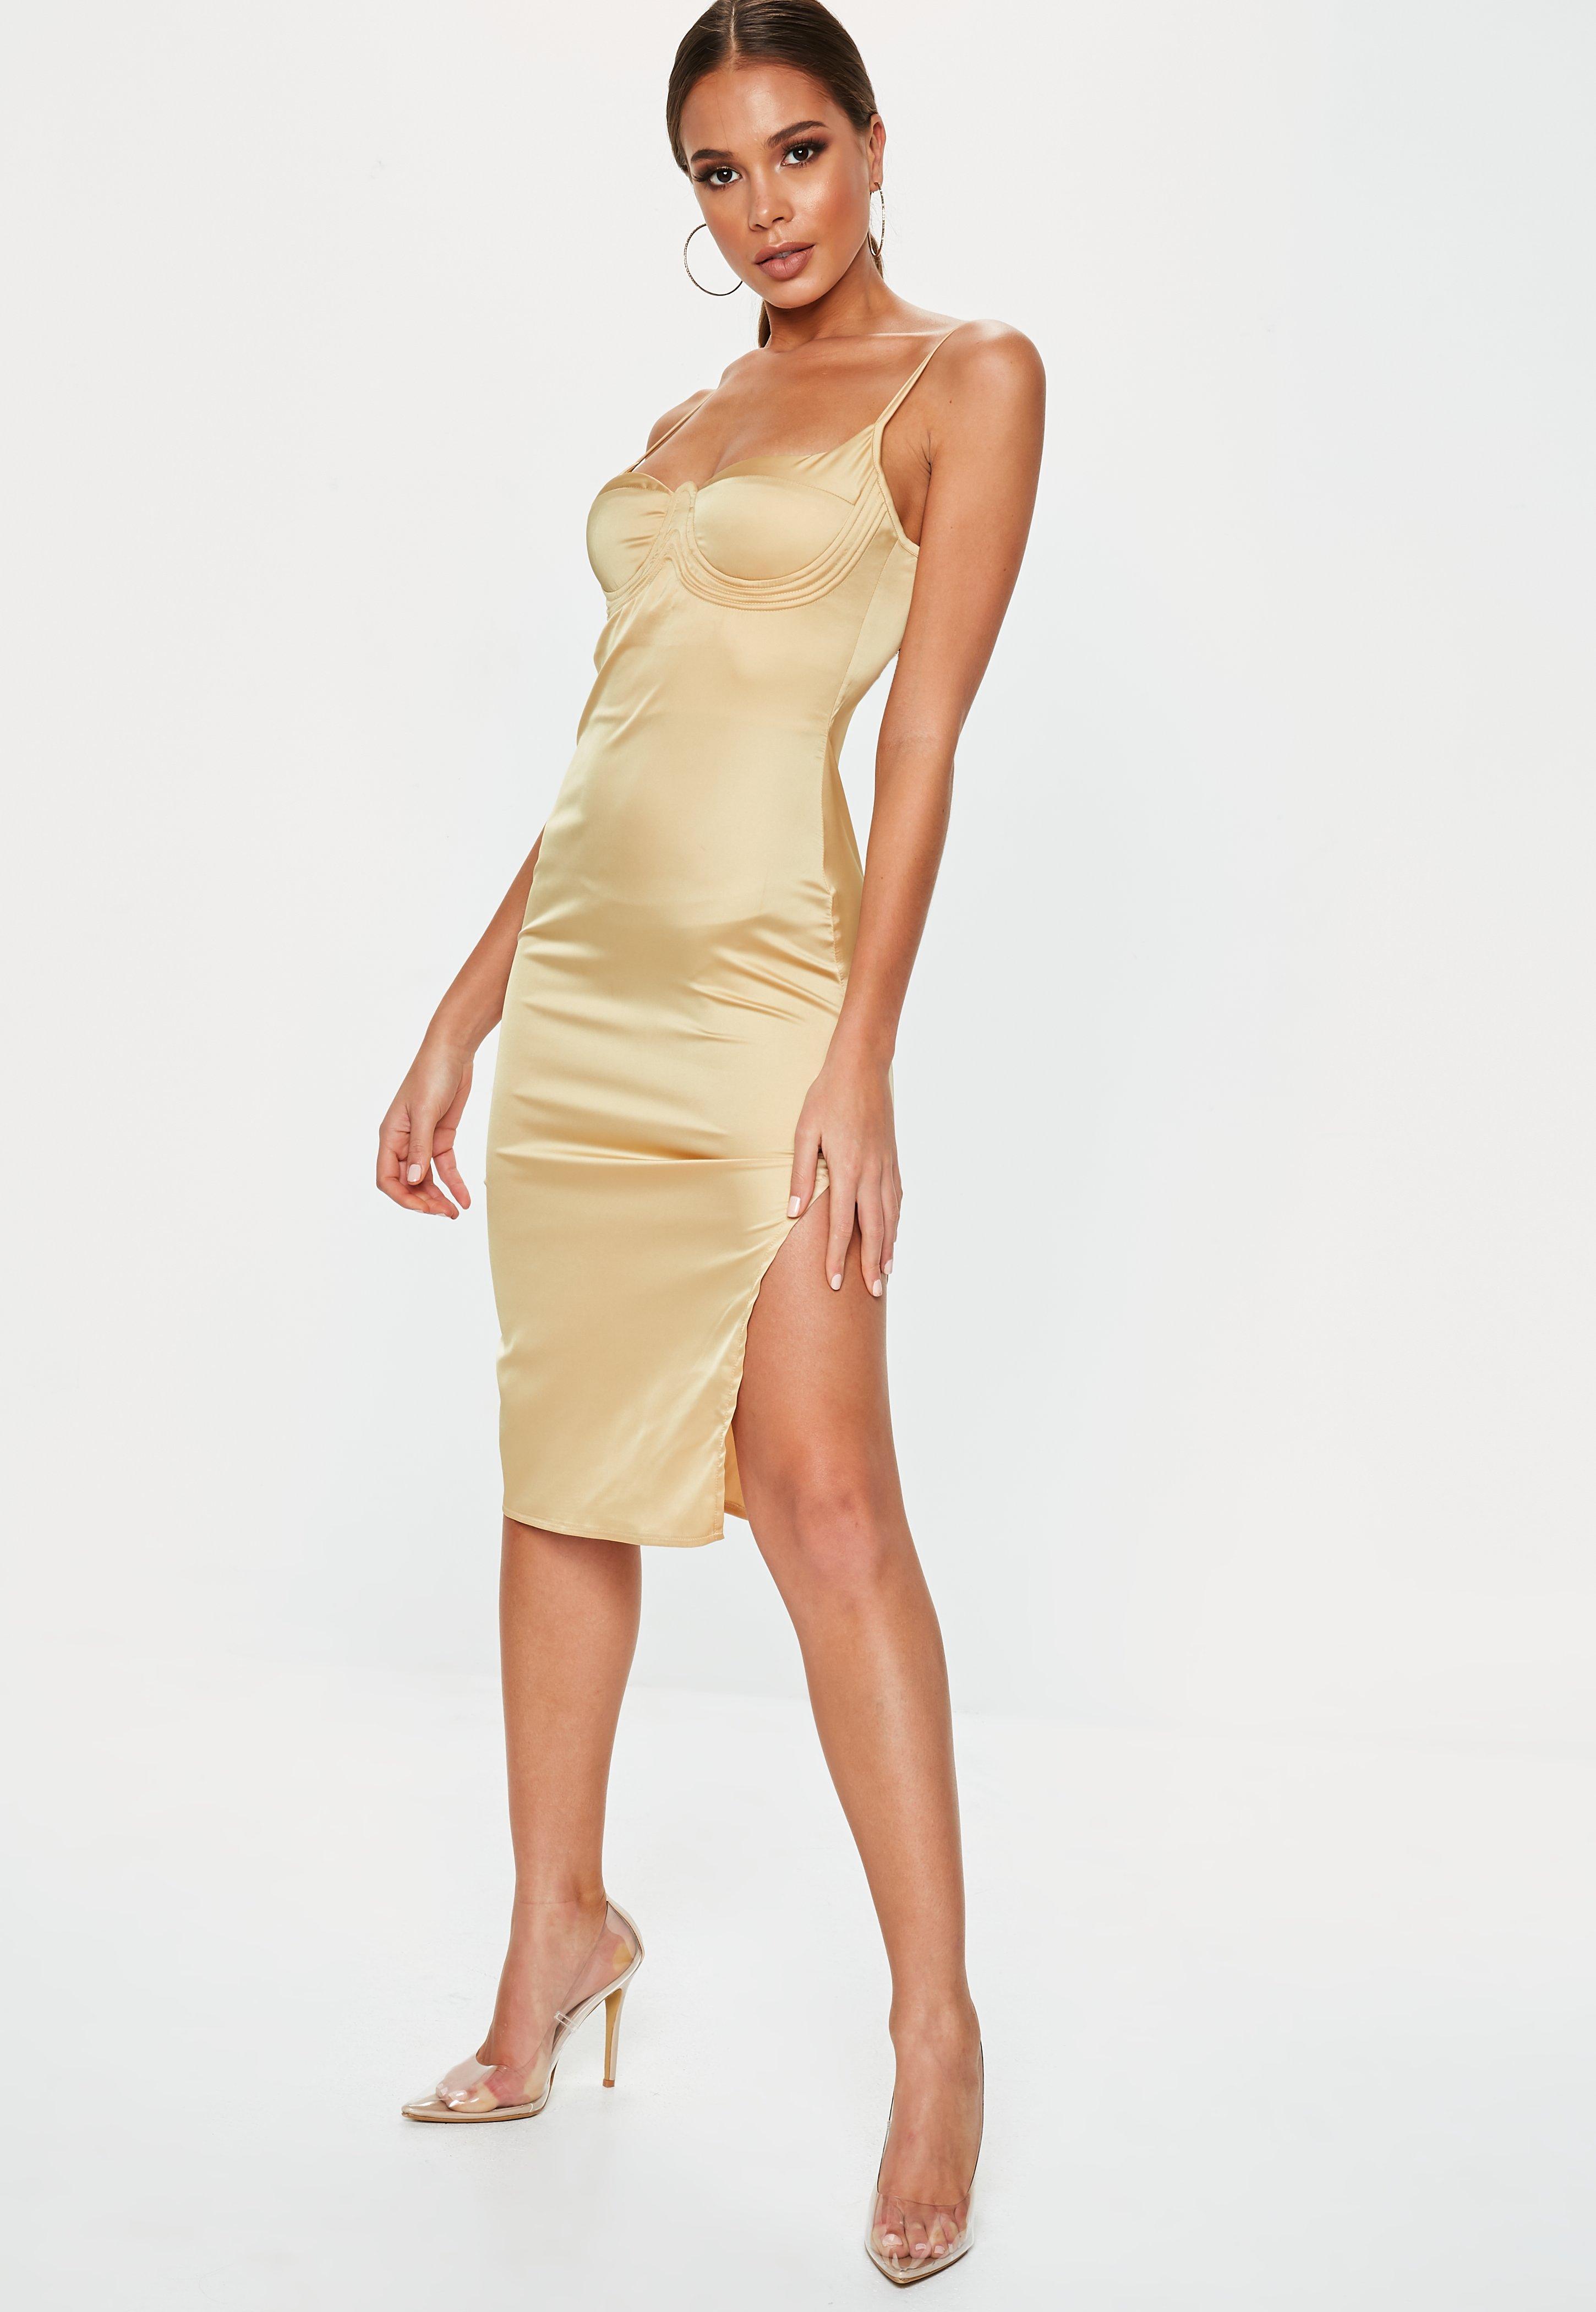 457a5670ba Jade Satin Slip Dress Jade Lingerie Emerald Satin t